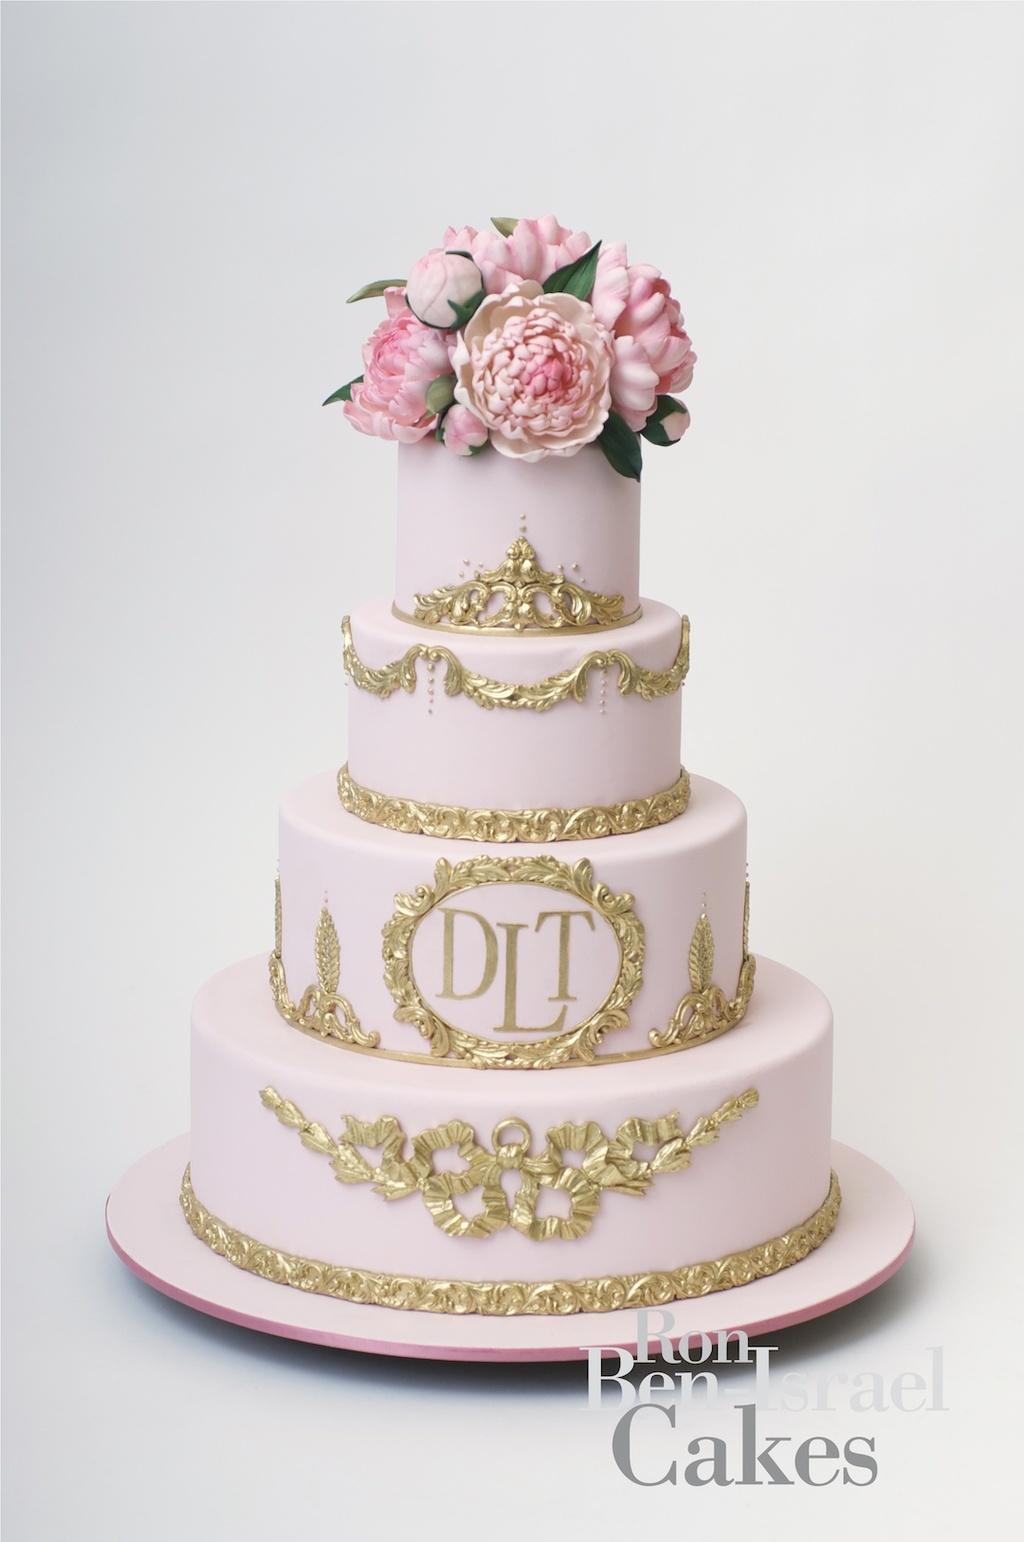 Wedding-cake-inspiration-ron-ben-isreal-wedding-cakes-light-pink-gold.original.full